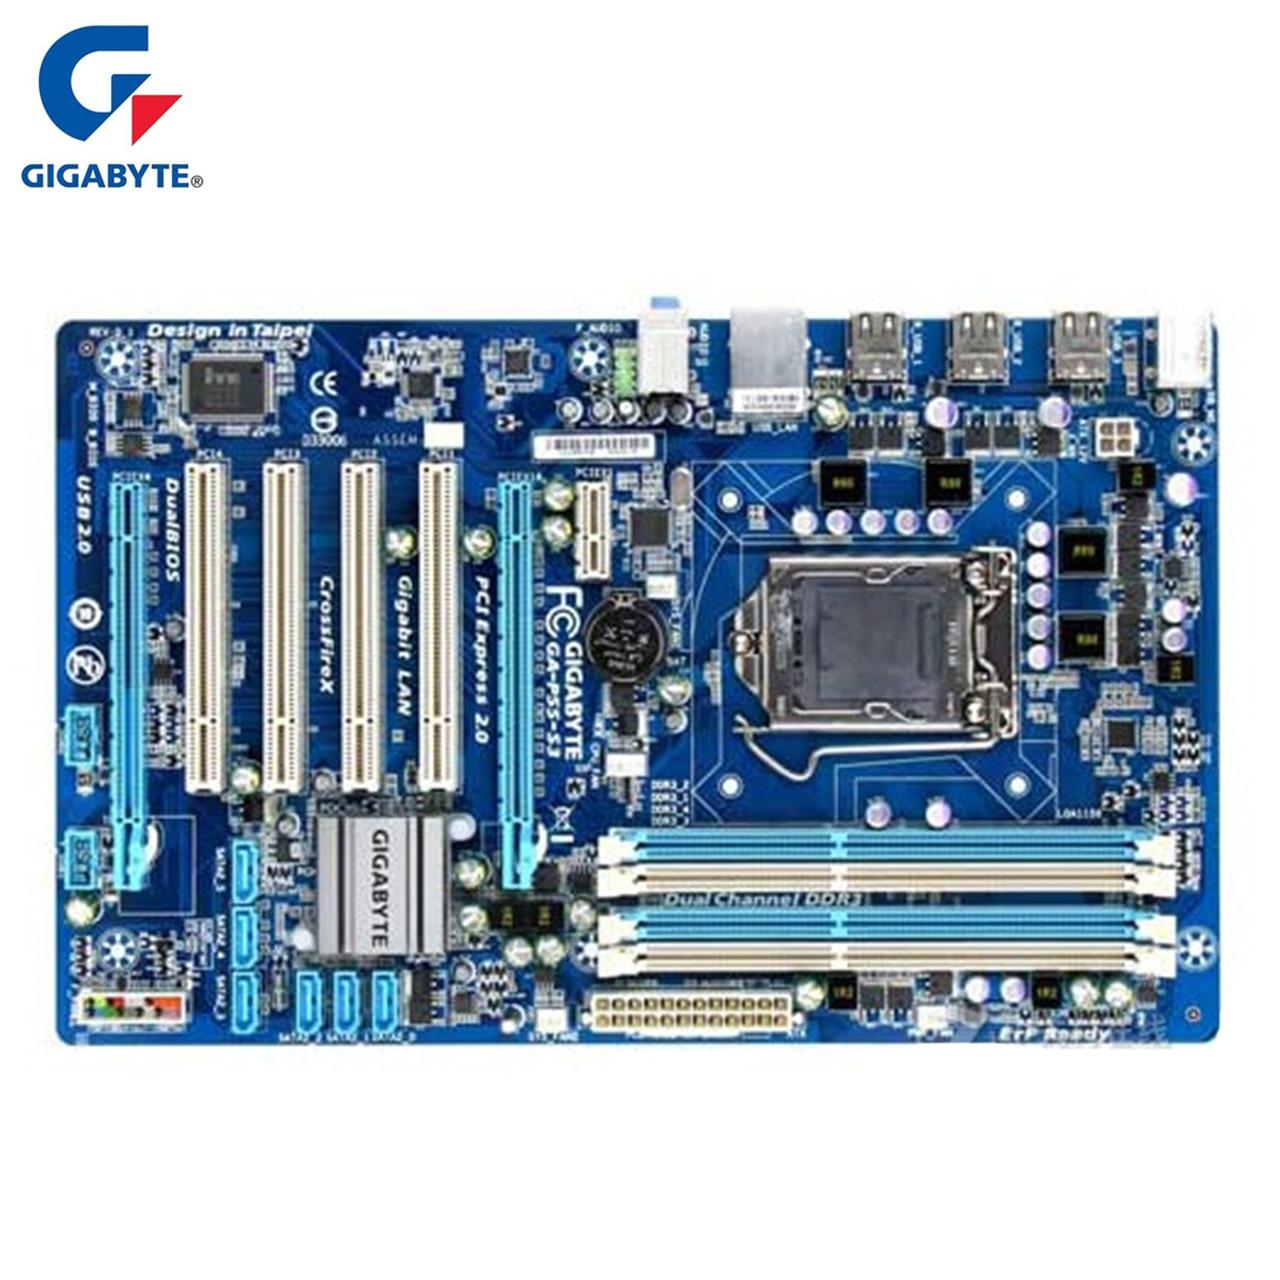 Gigabyte GA-P55-S3 100% Original Motherboard LGA 1156 DDR3 16G H55 P55 S3 P55-S3 Desktop Mainboard Systemboard Used Mother Board